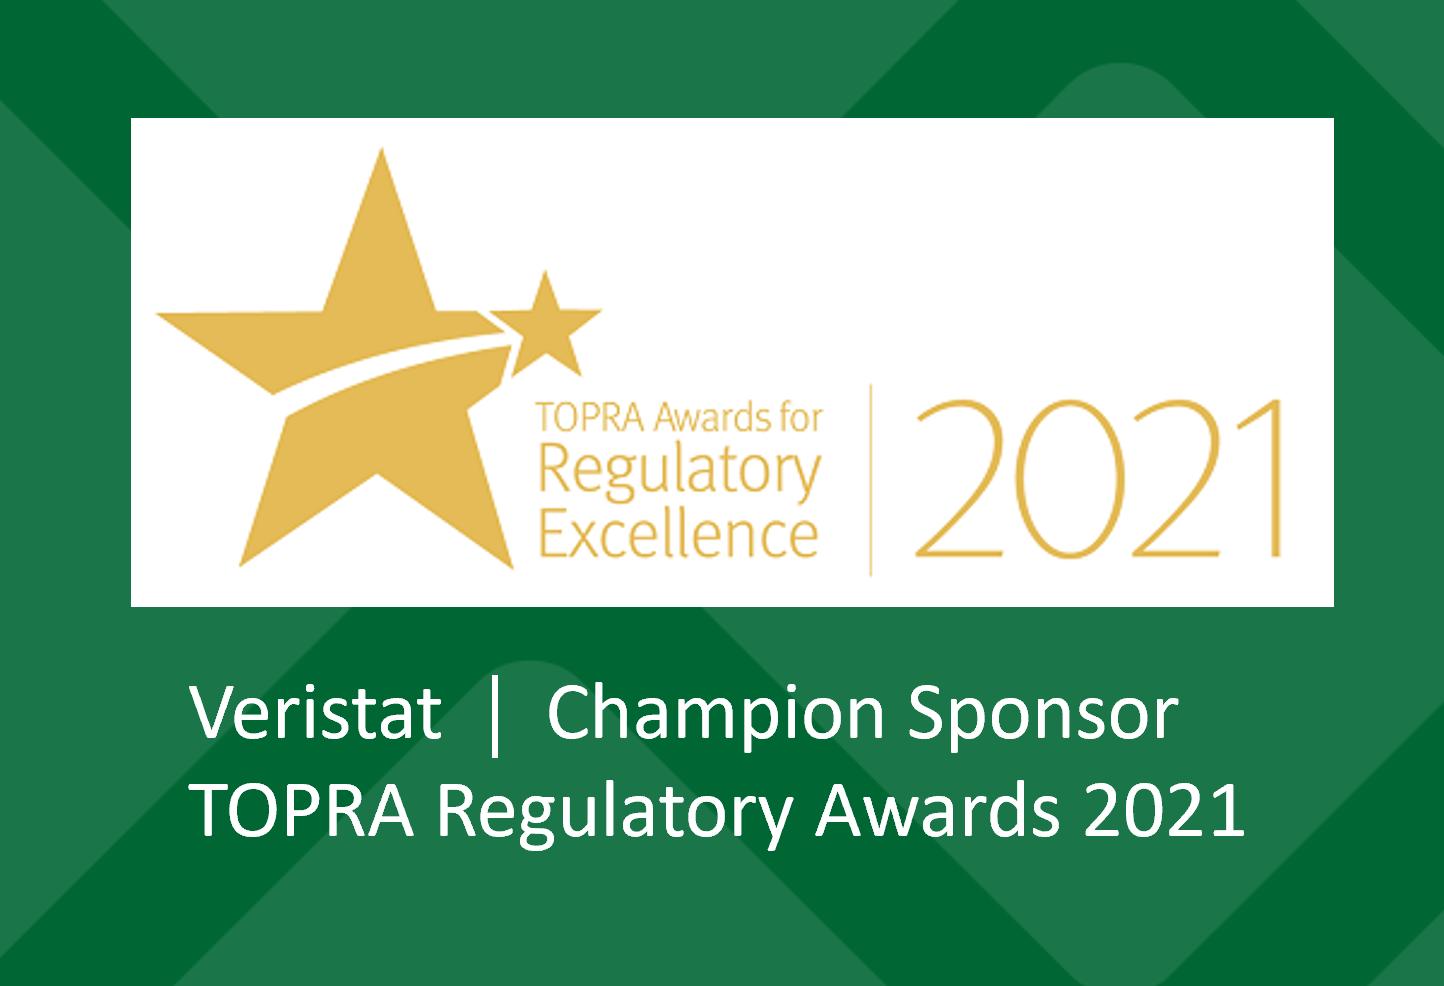 2021 TOPRA Awards Event